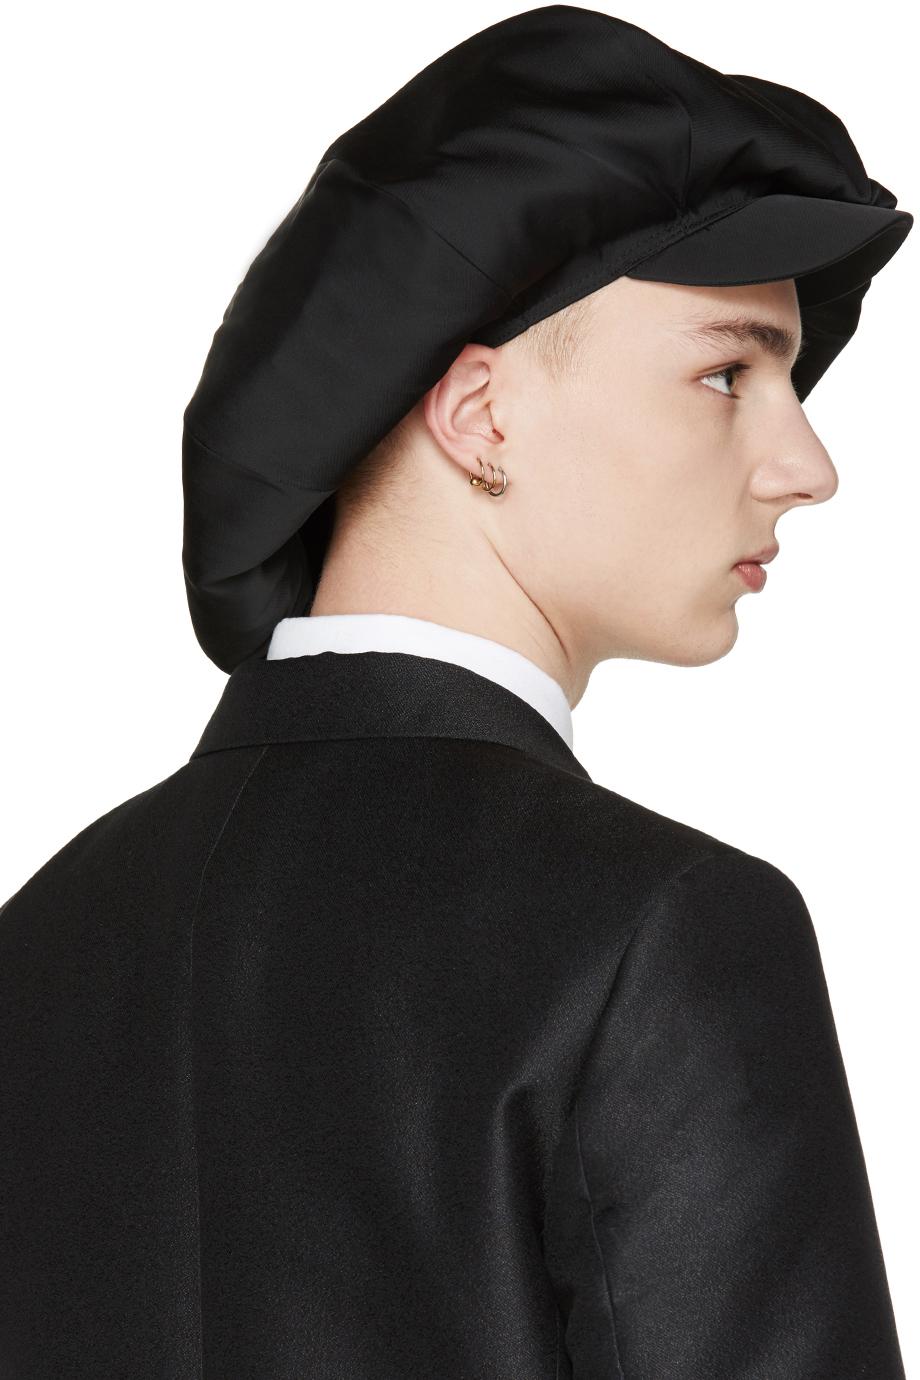 a2ff8c81 Comme des Garçons Black Oversized Newsboy Cap in Black for Men - Lyst